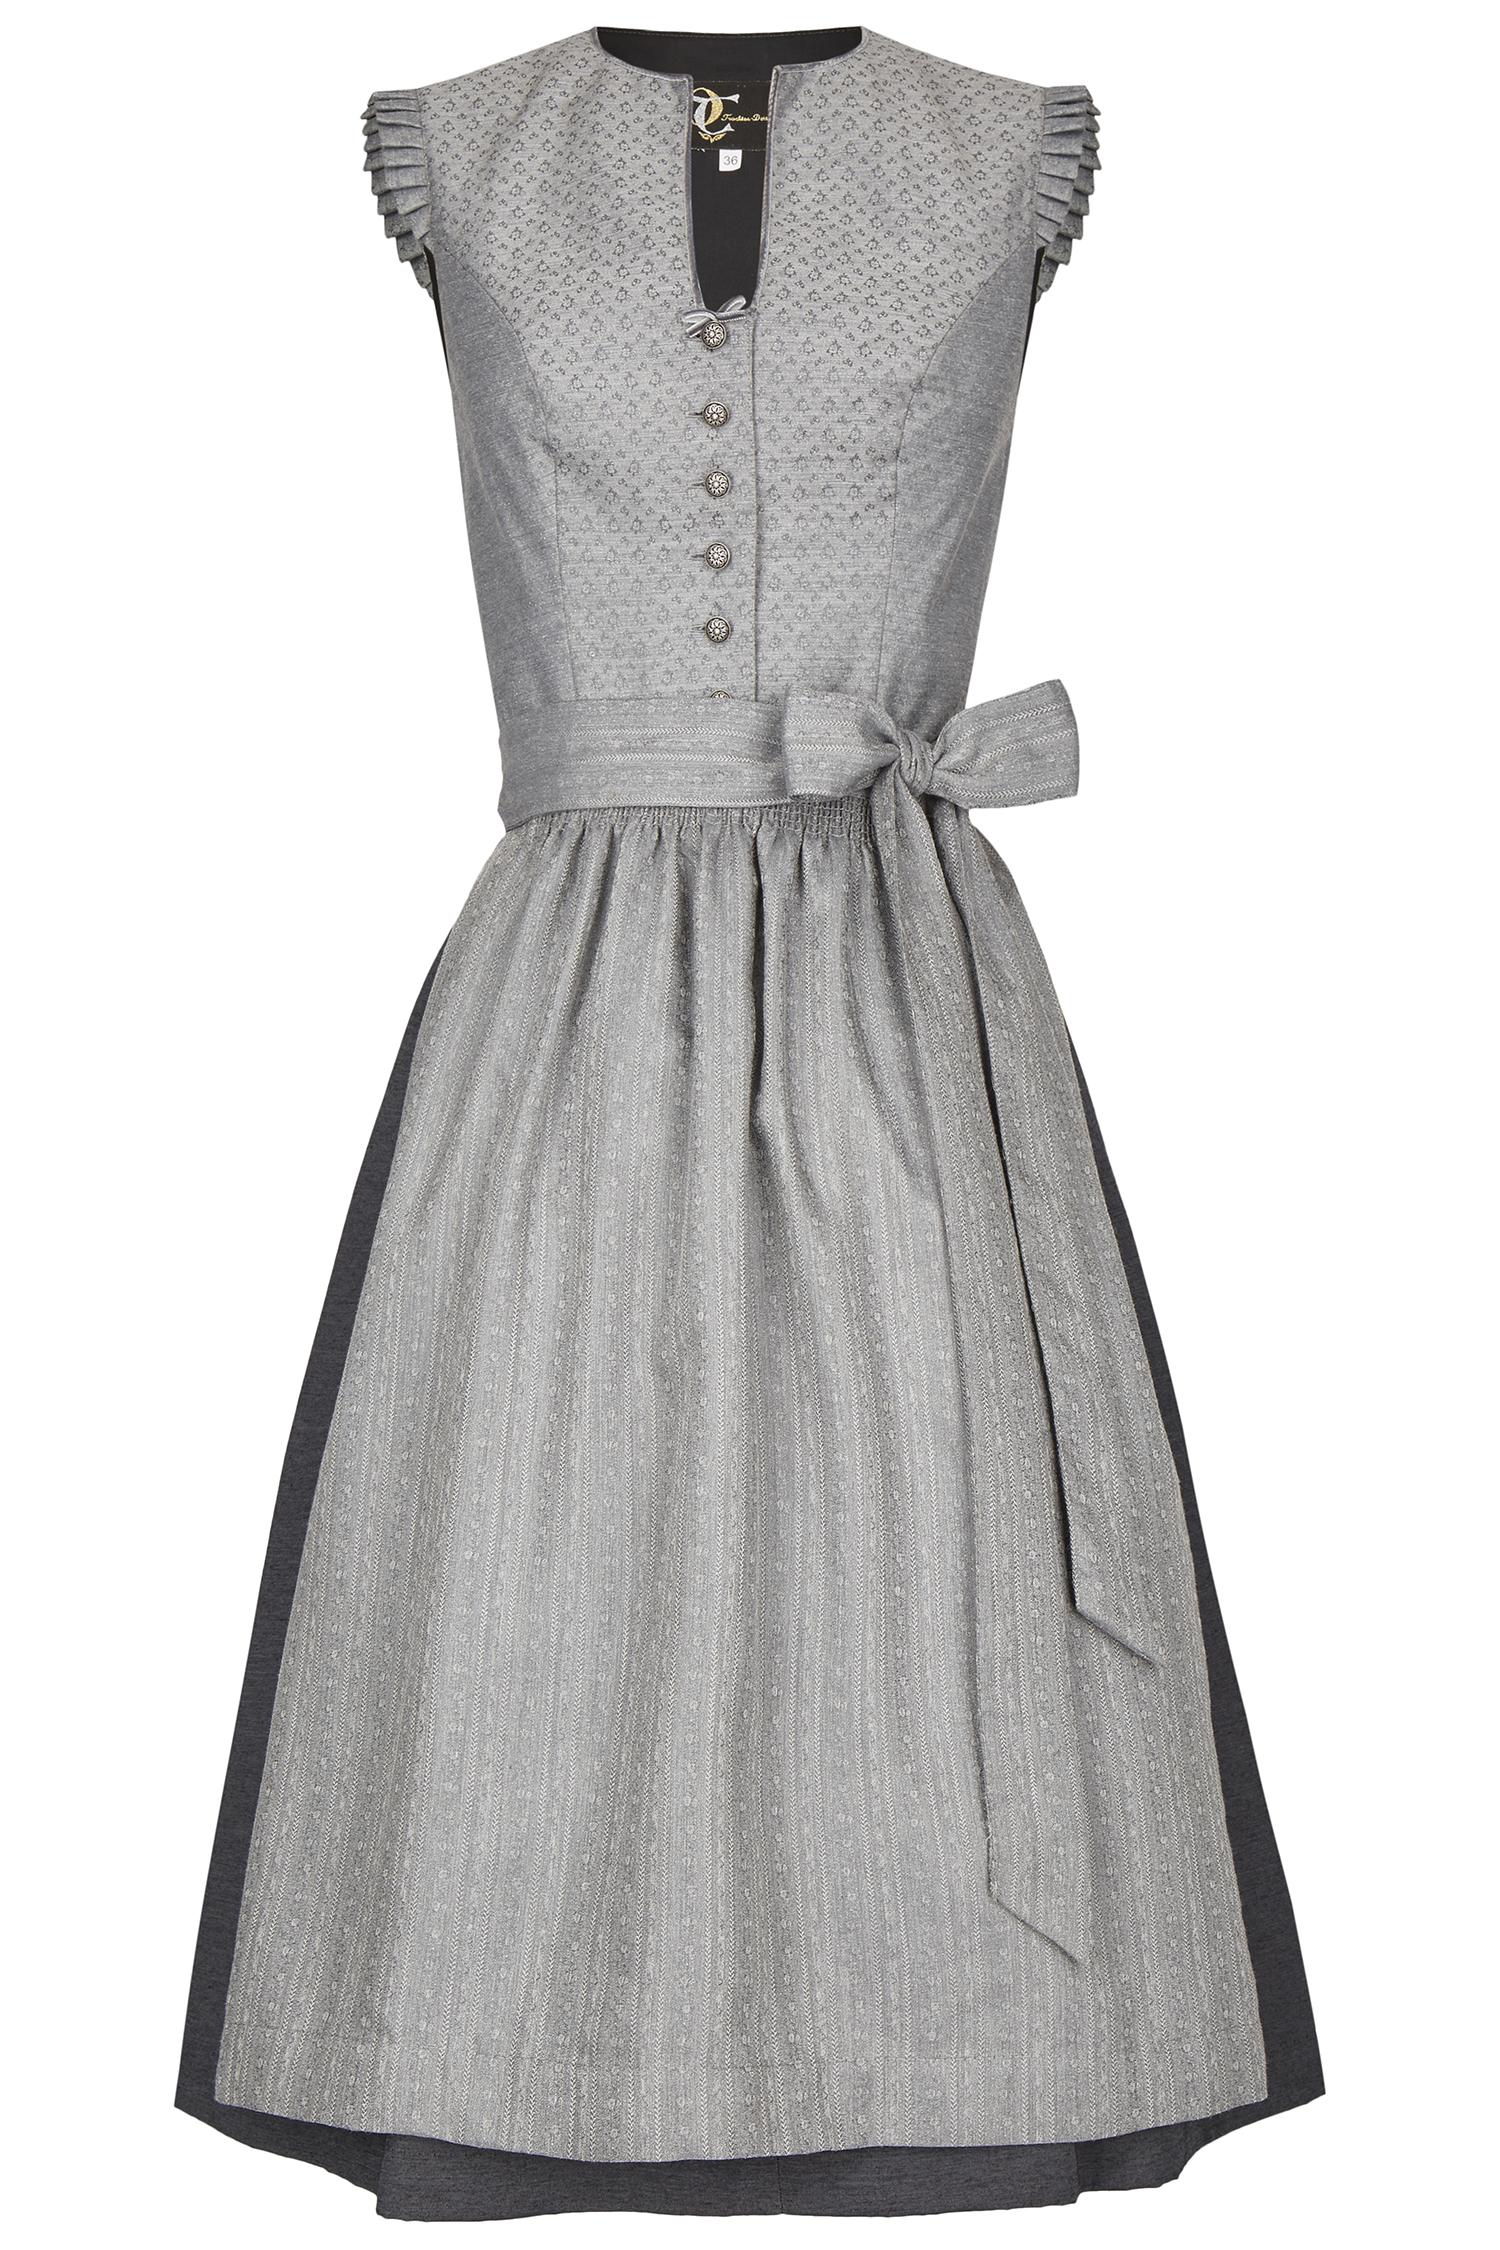 Dirndl Claudia 38 | 1901 silber